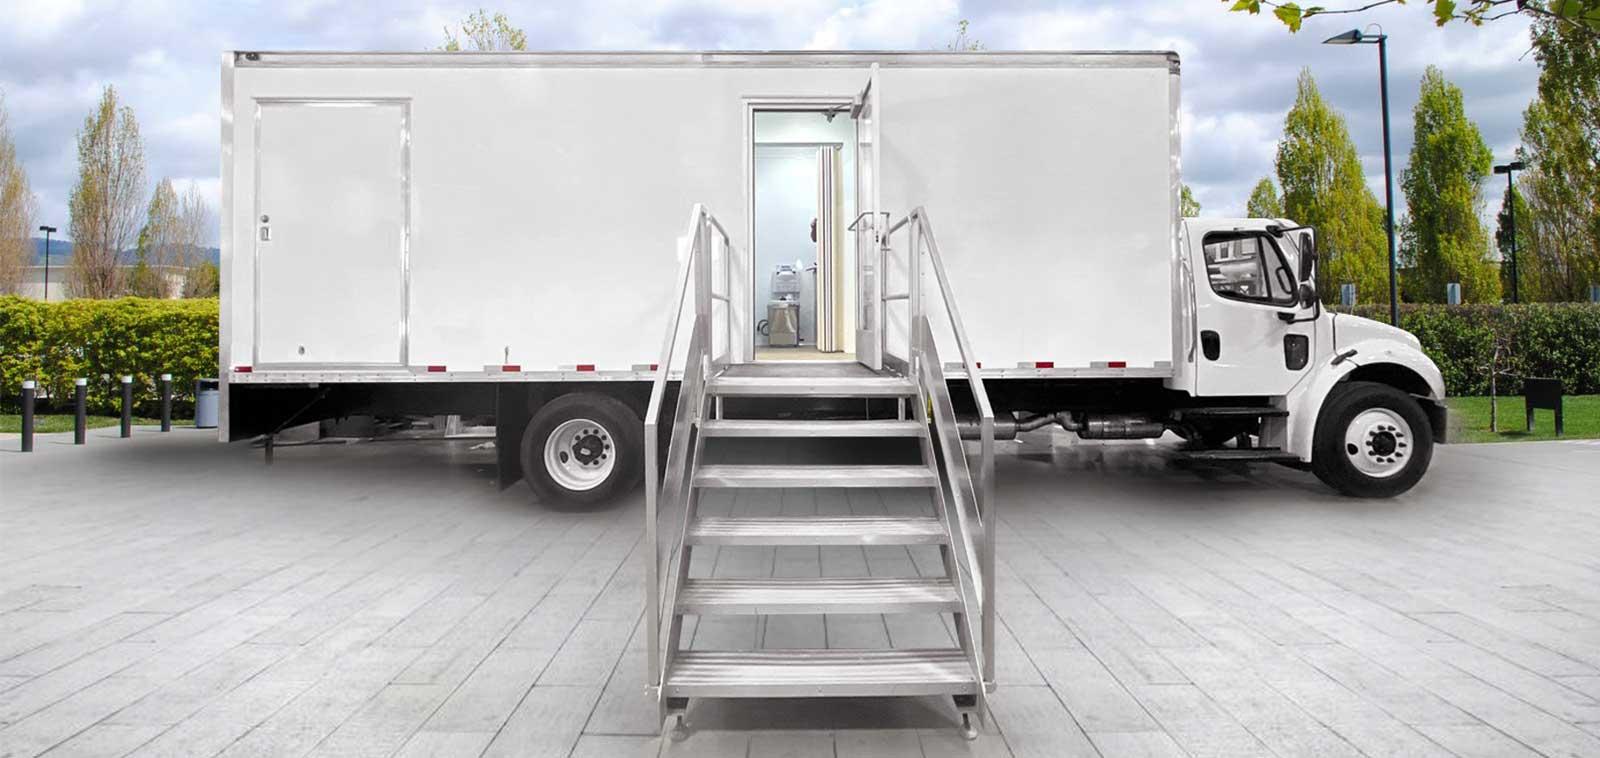 Plan_A_Medical_Box_Truck_2